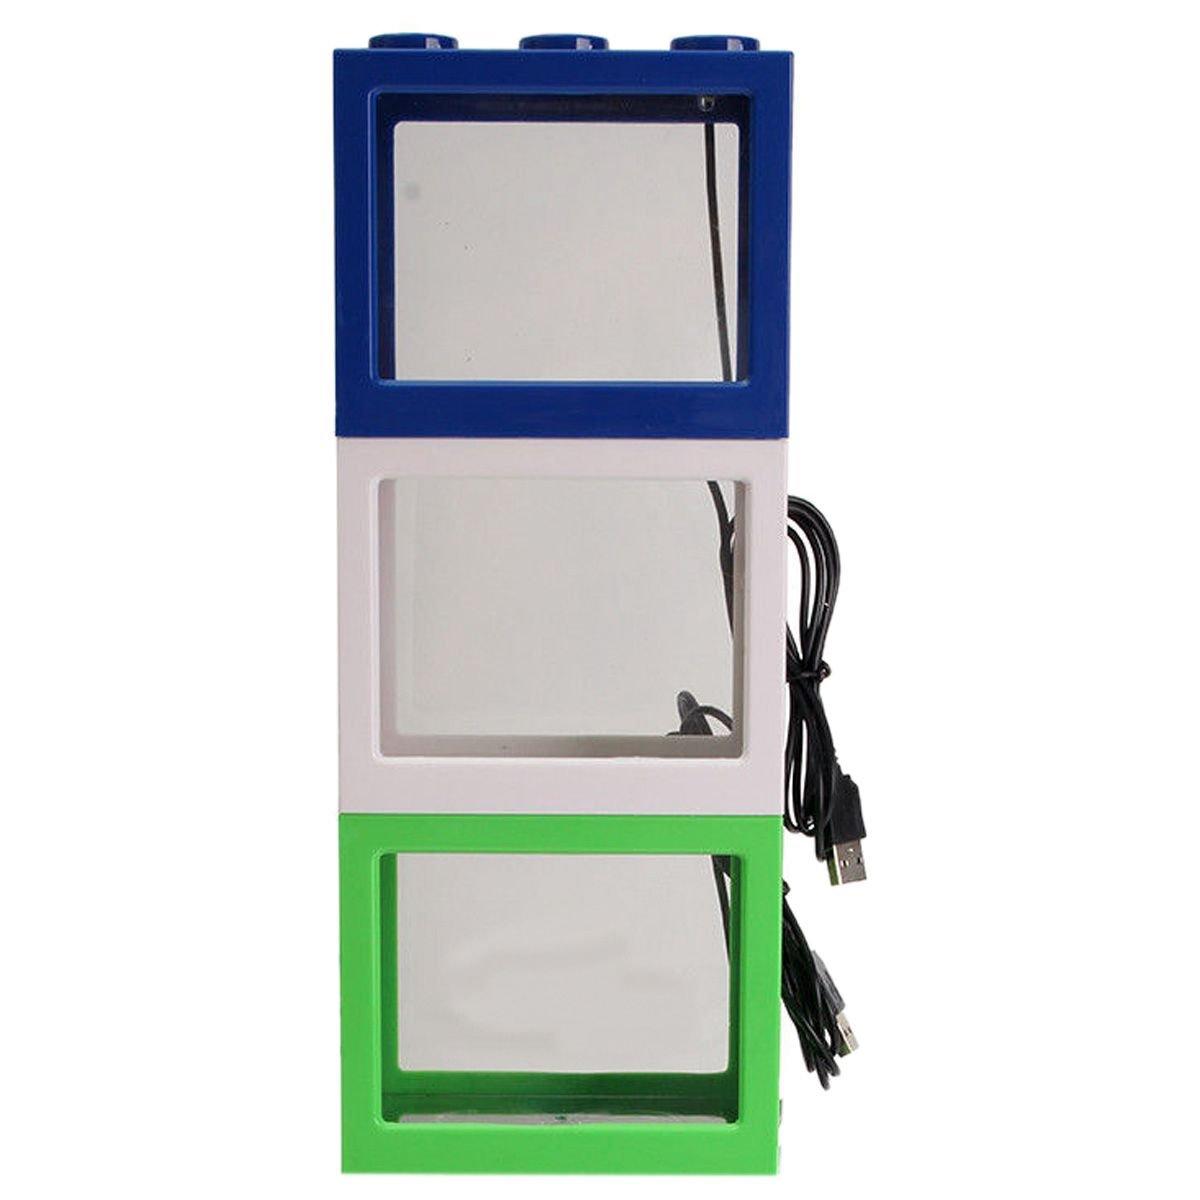 Blanco SODIAL Pecera clara de iluminacion LED USB mini Acuario de ornamento Decoracion de escritorio de oficina